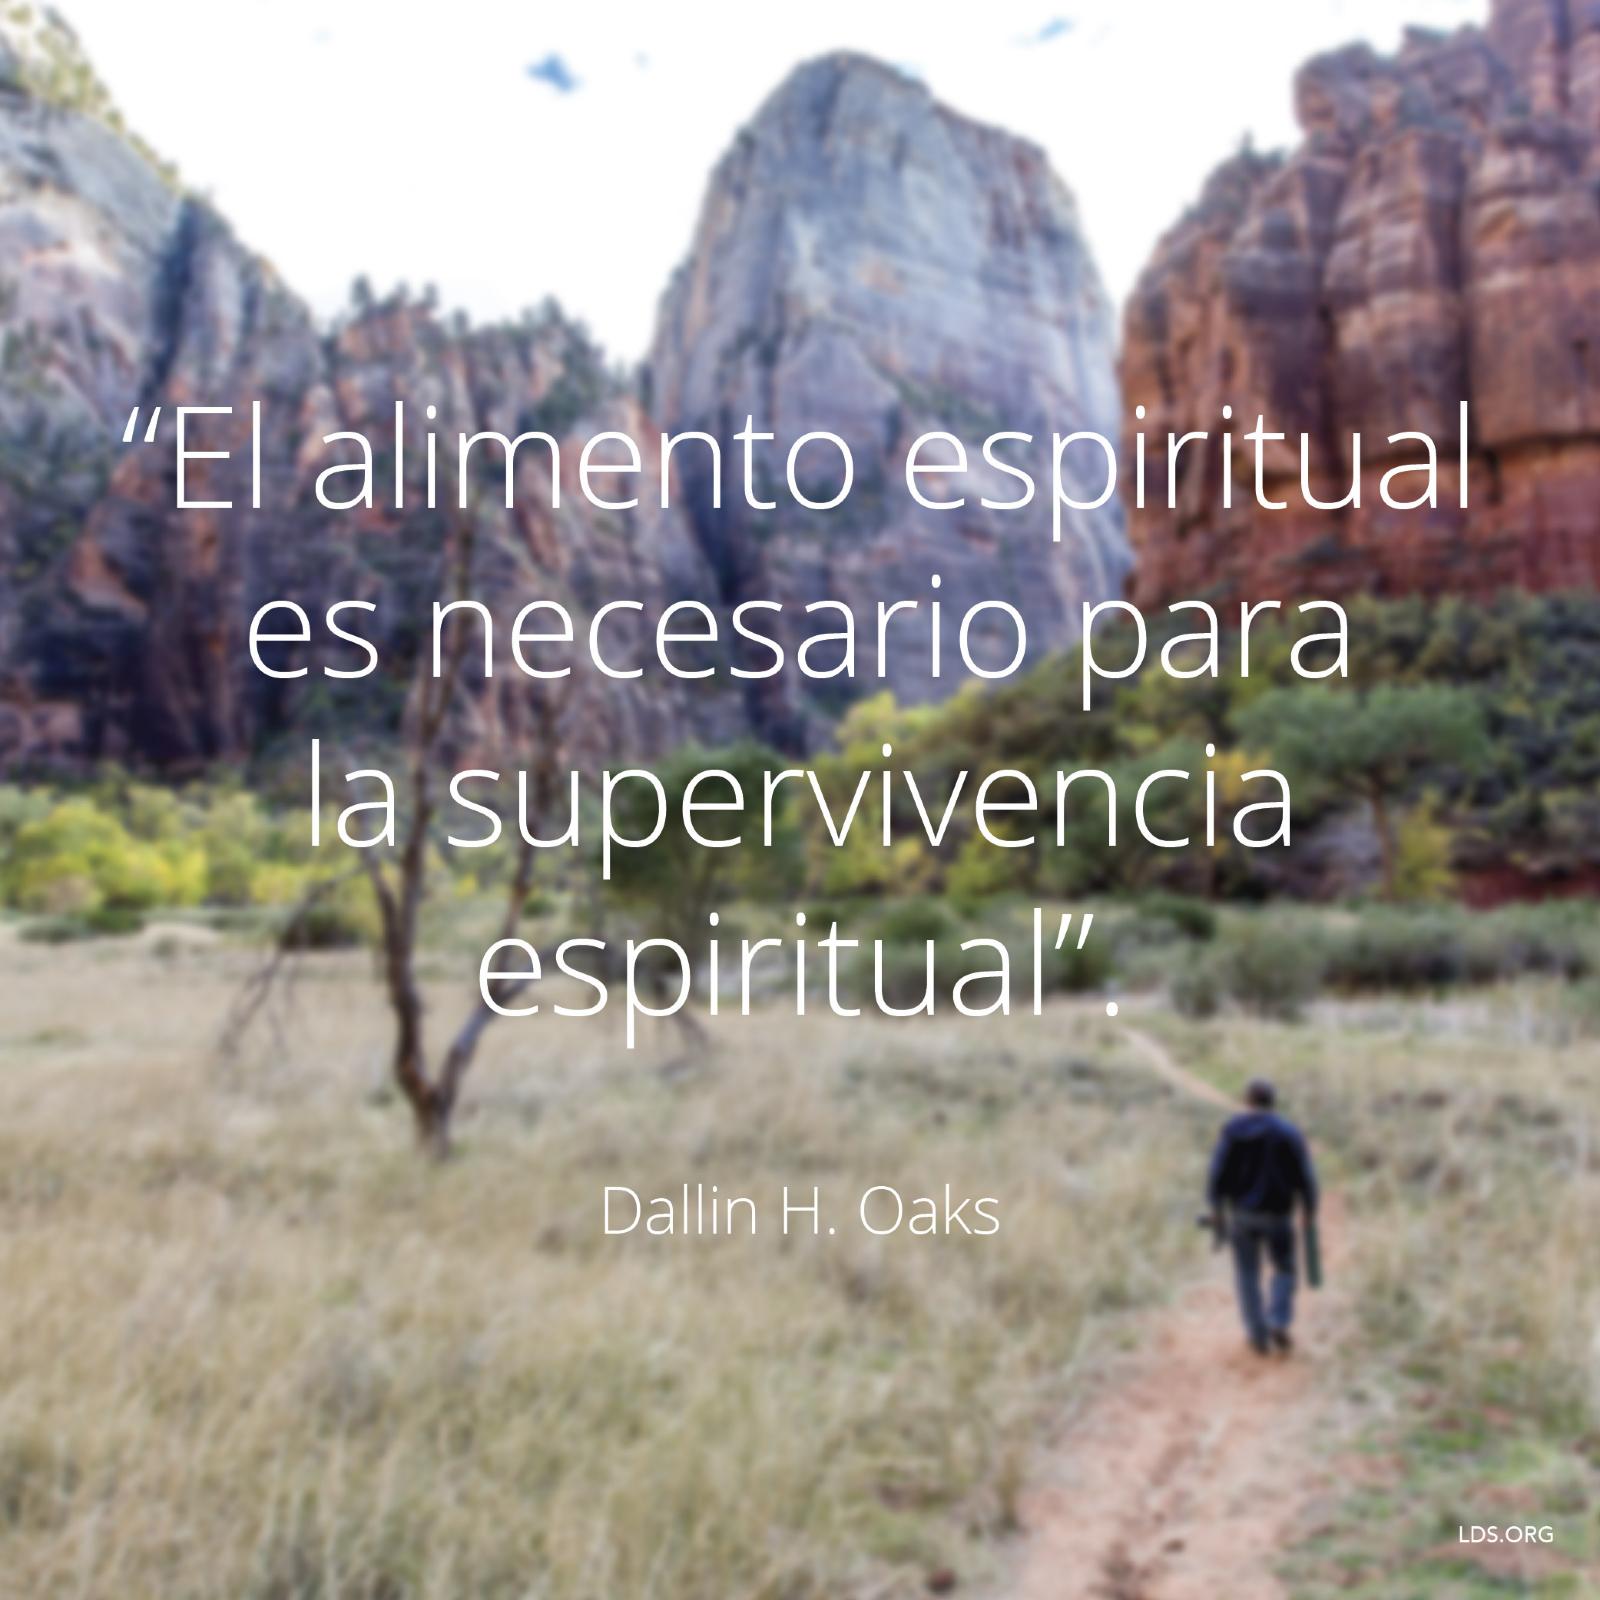 El alimento espiritual